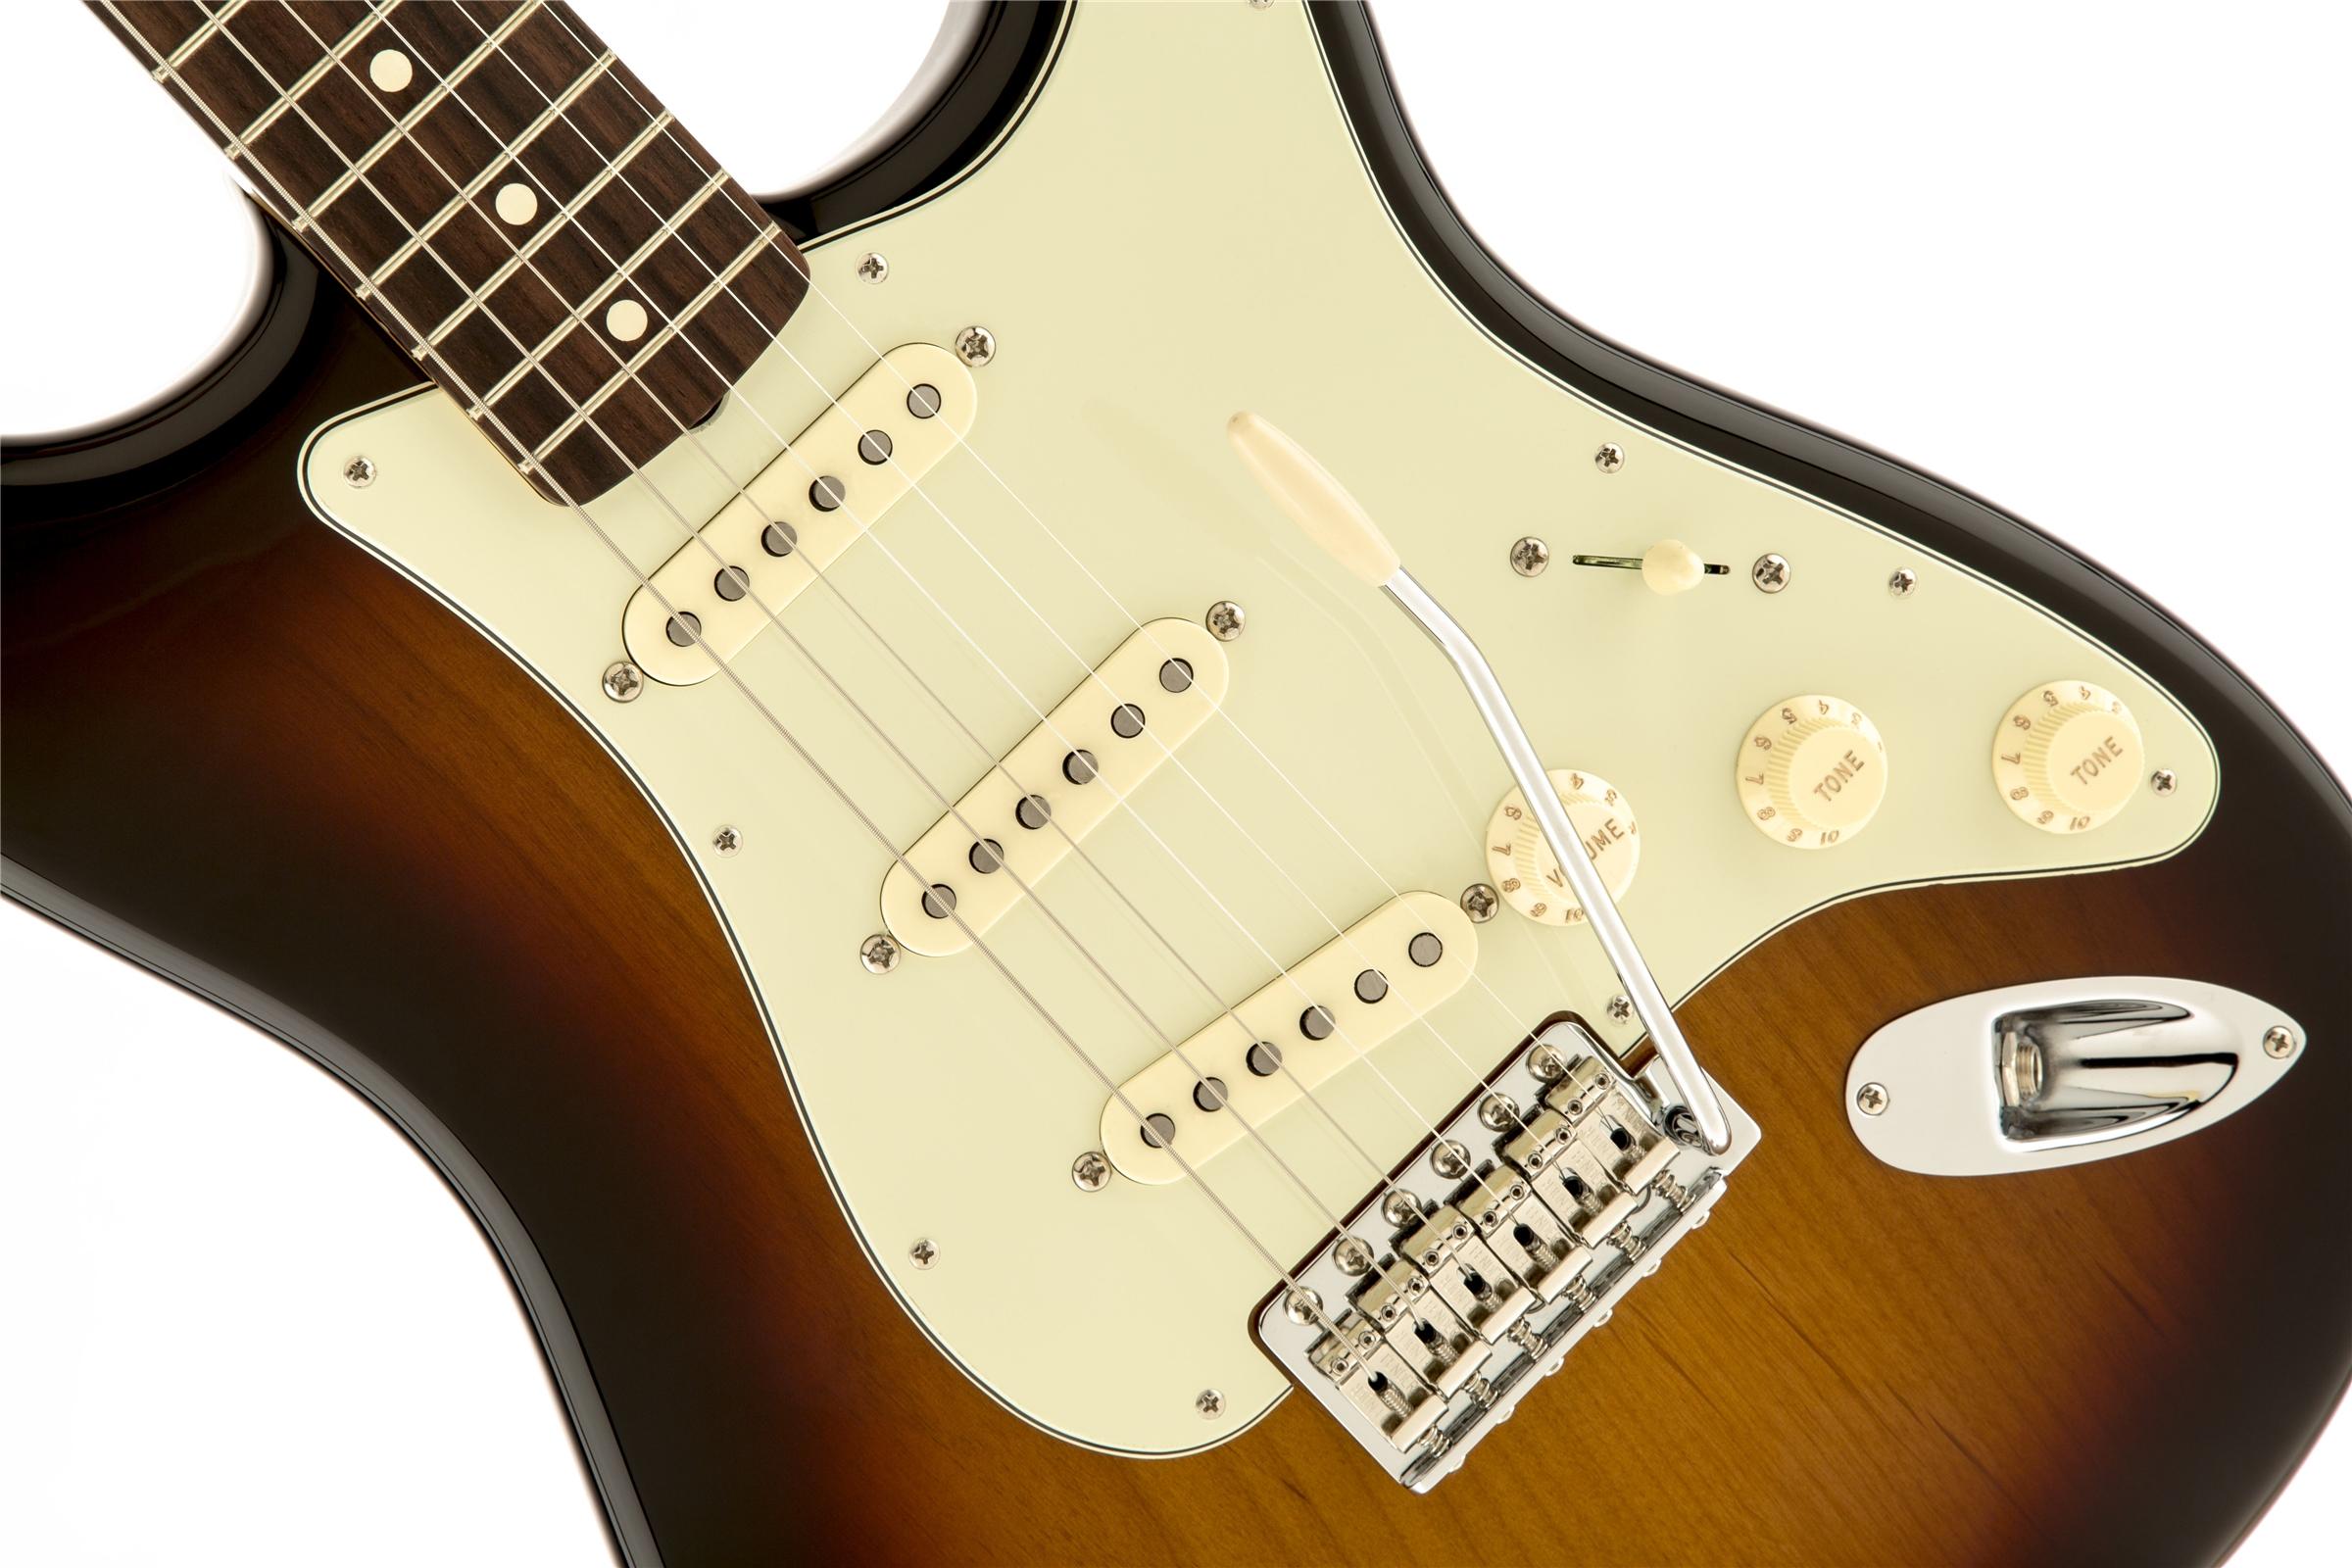 Fender Classic Series '60s Stratocaster® 3-Color Sunburst Rosewood Fingerboard Electric Guitar